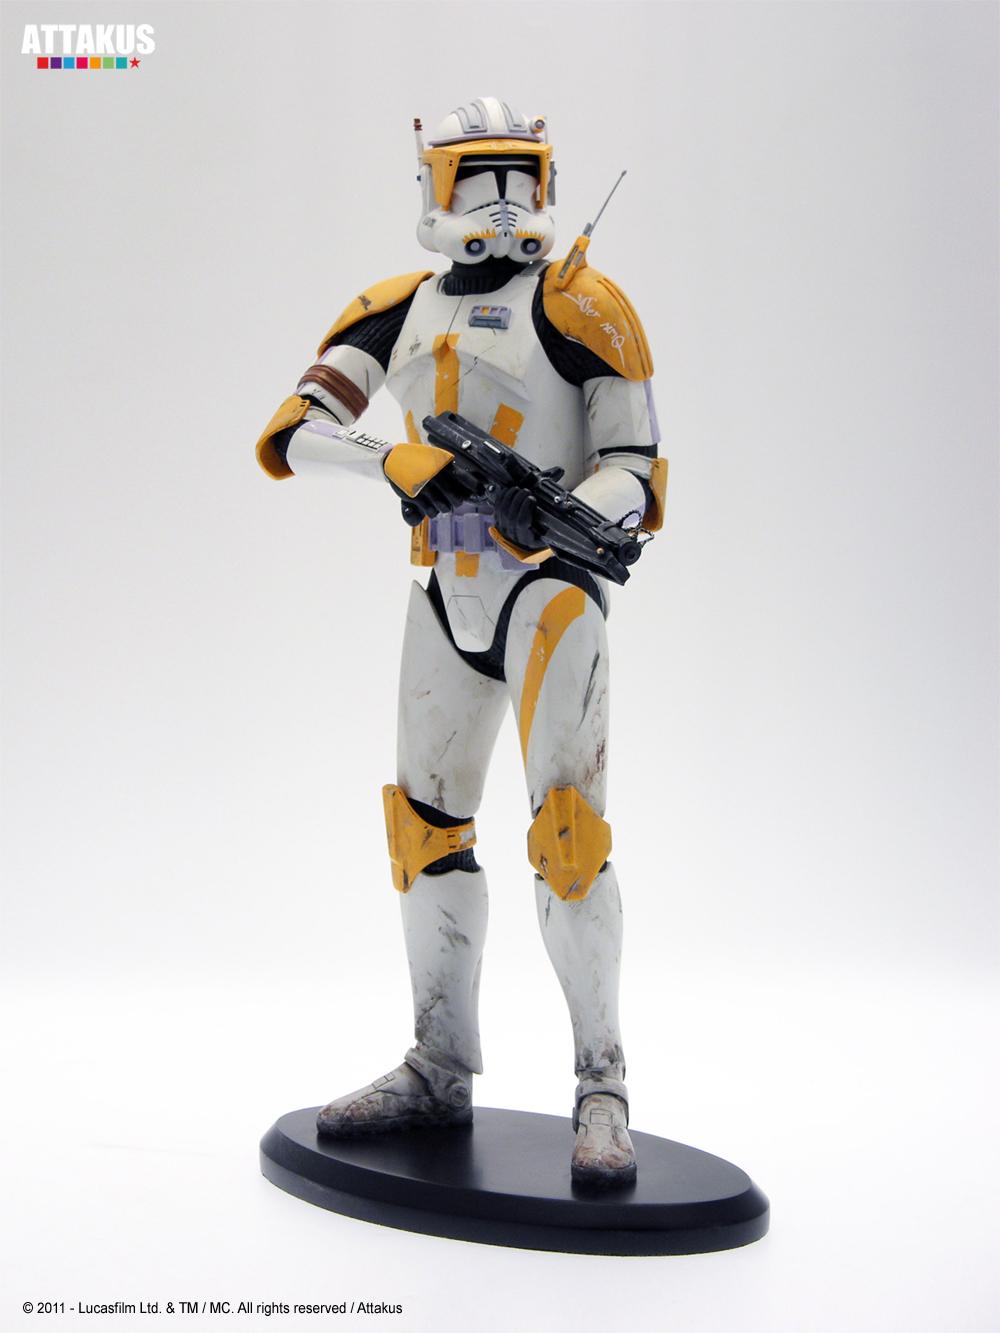 Statues Vinyls Toys Amp Collectibles Commander Cody